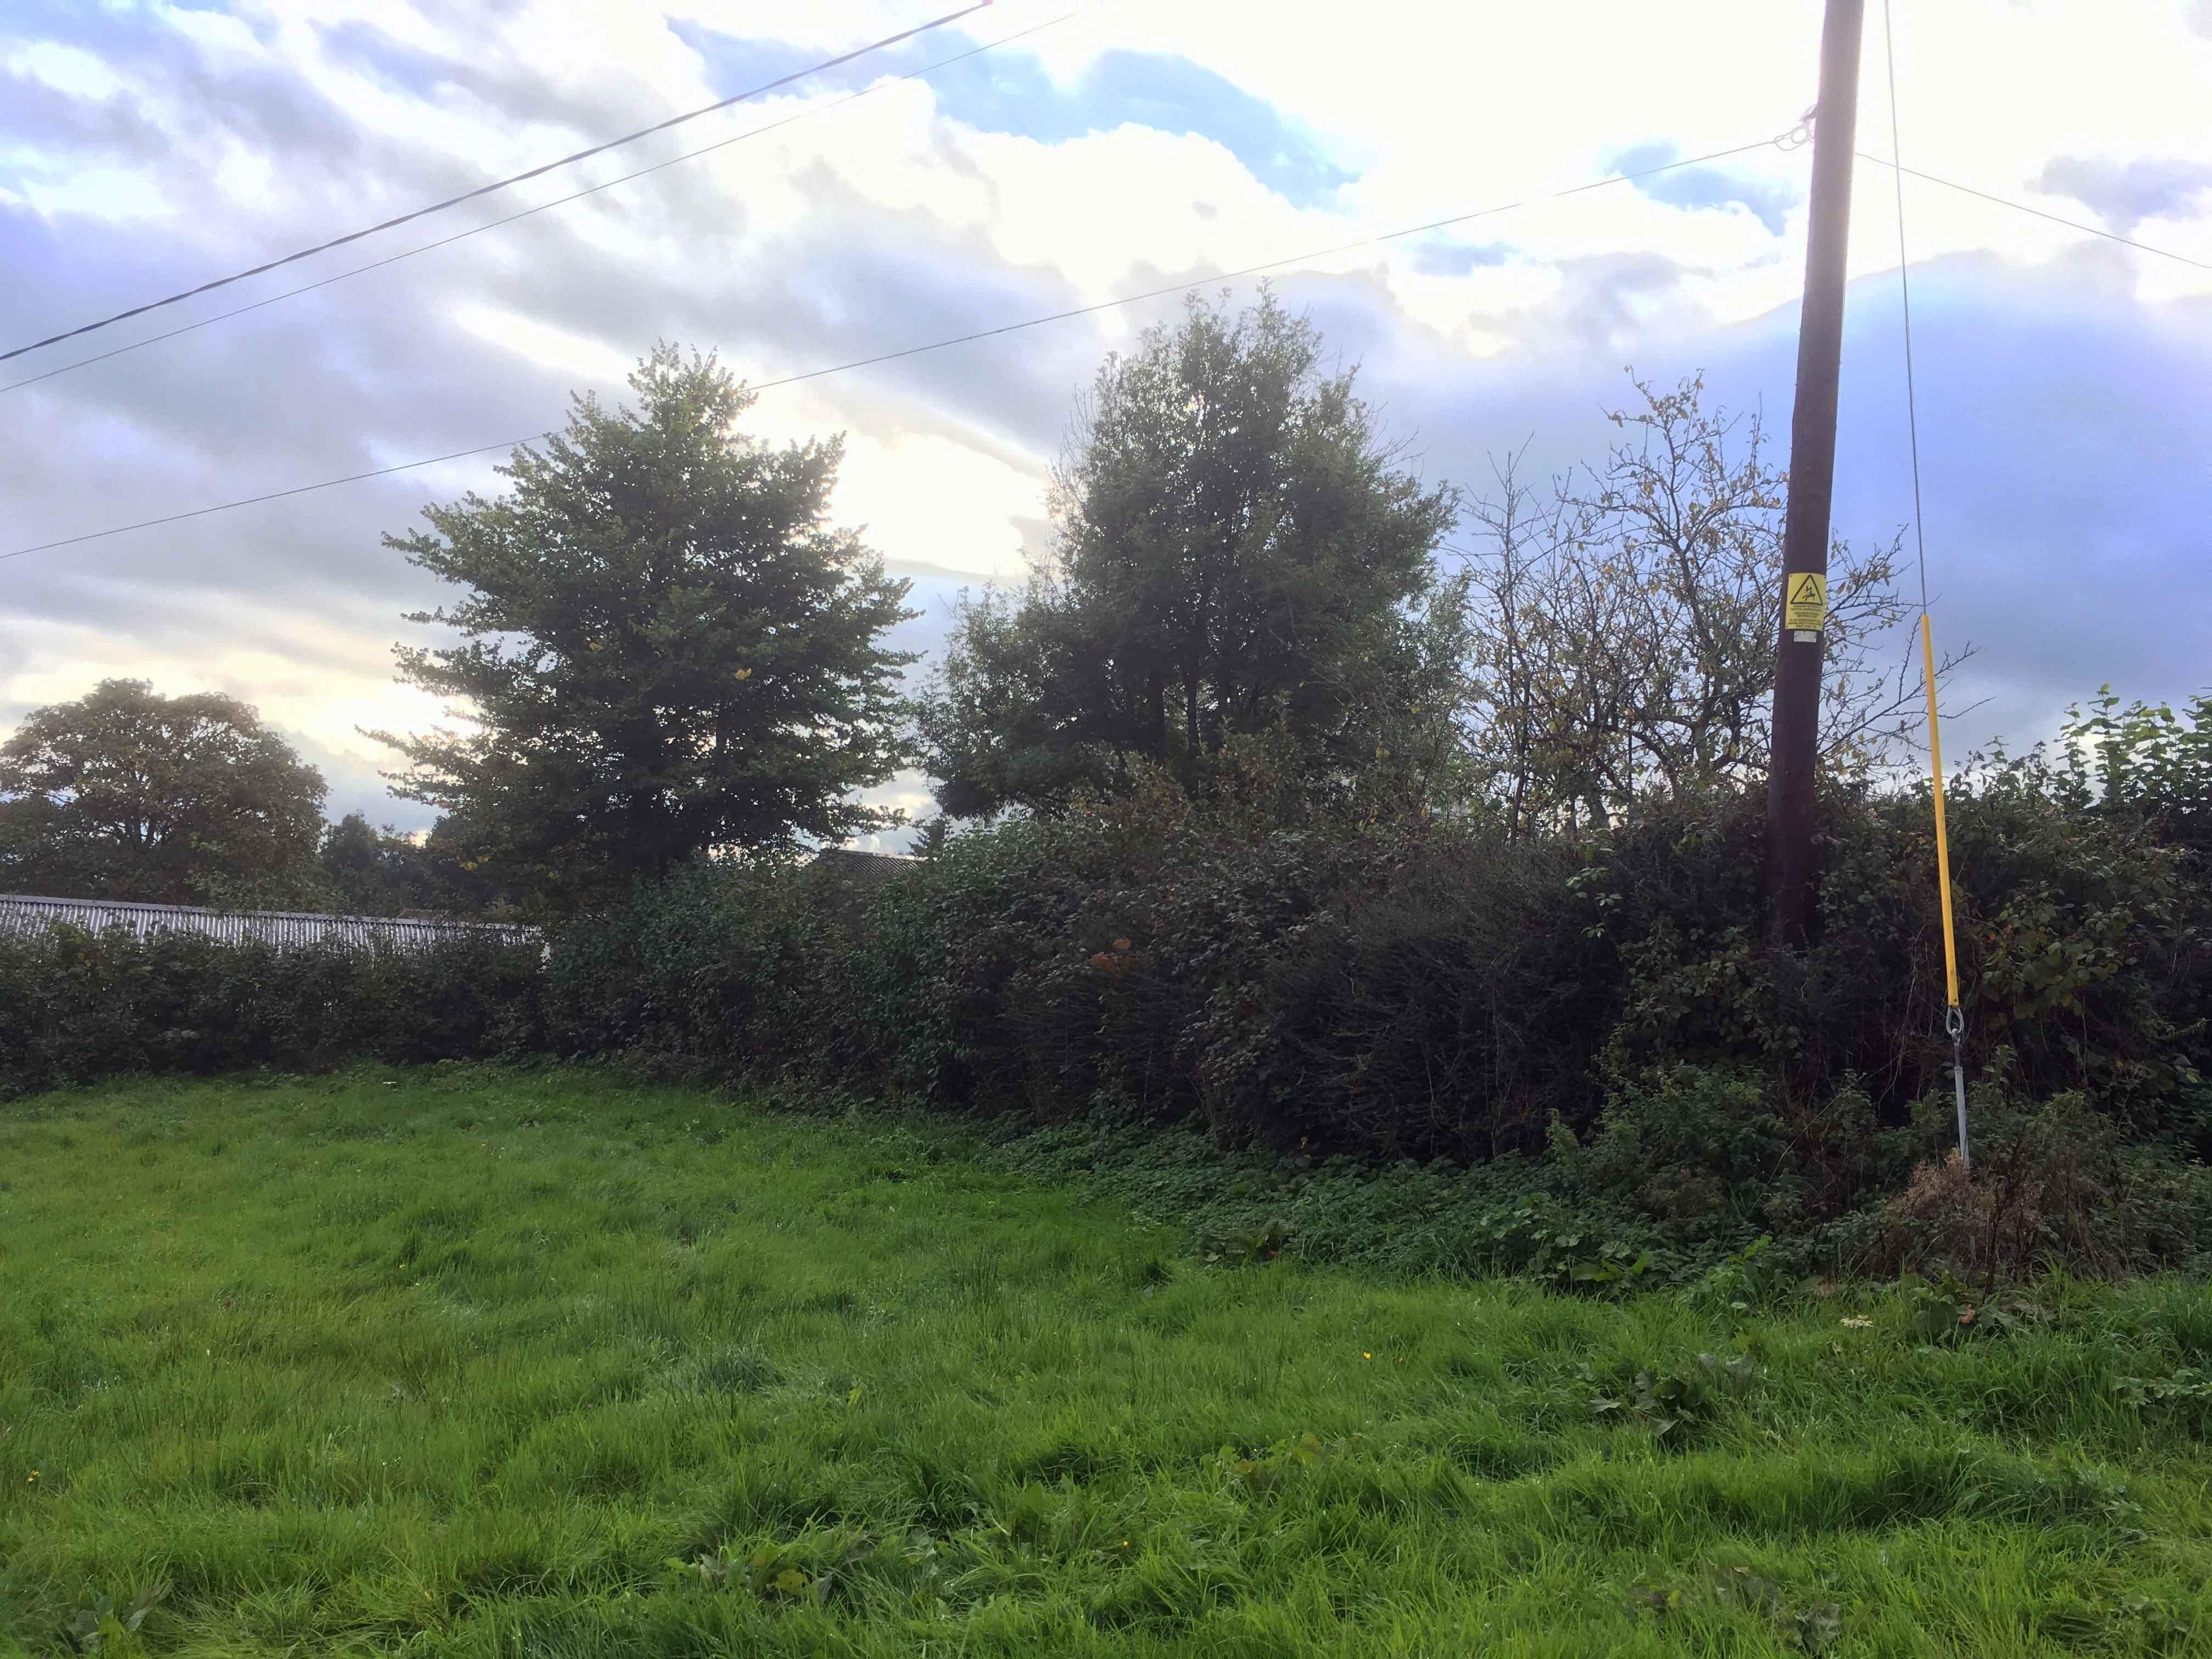 Rhandir-Llansadwrn-Llansadwrn-community-garden-top-corner